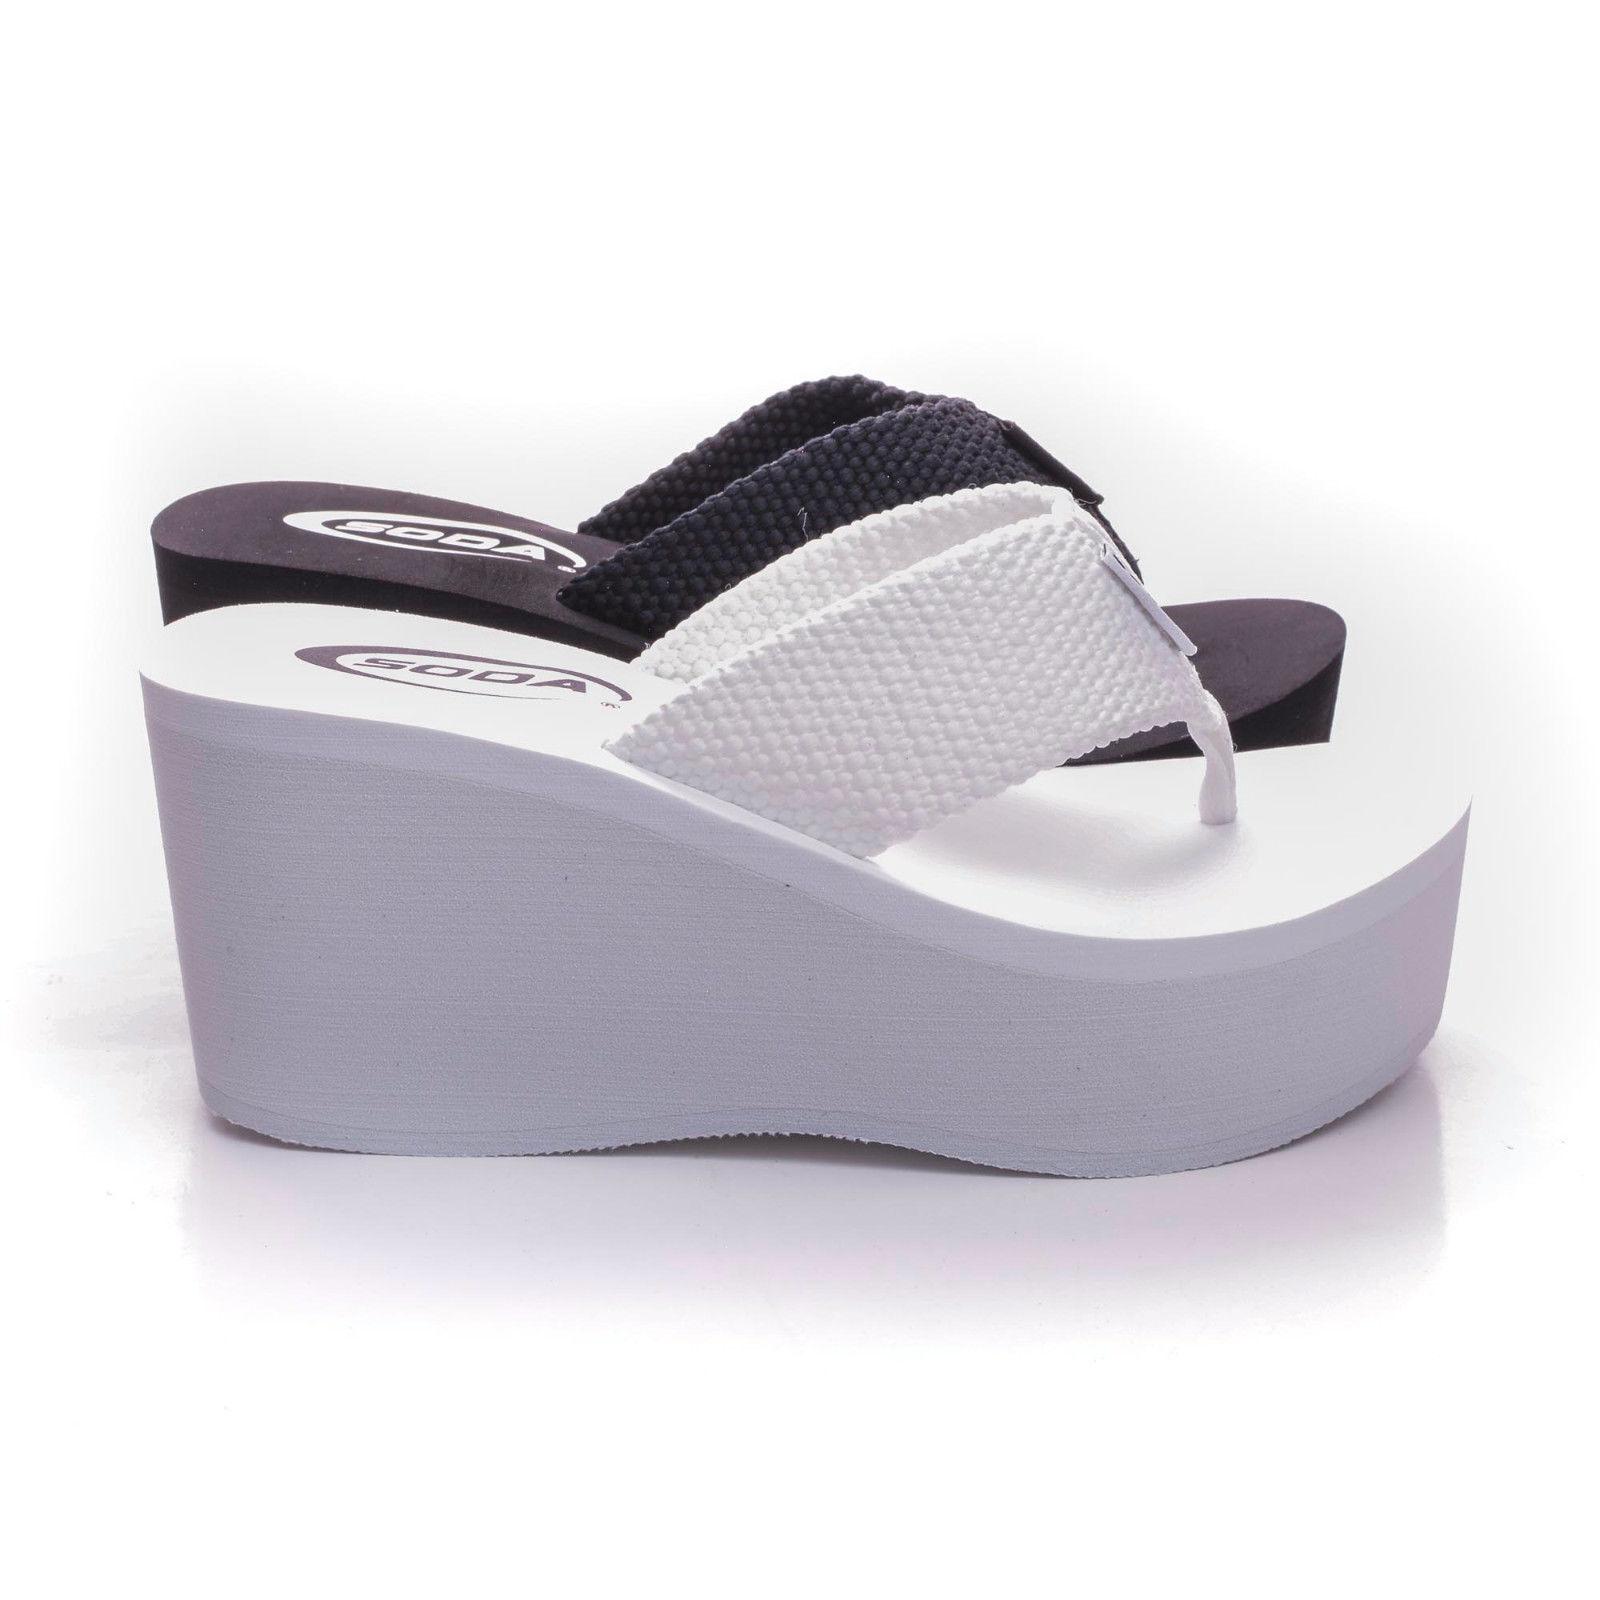 New Womens Sandals Wedge Shoes Platform Heels Thong Flip Flo